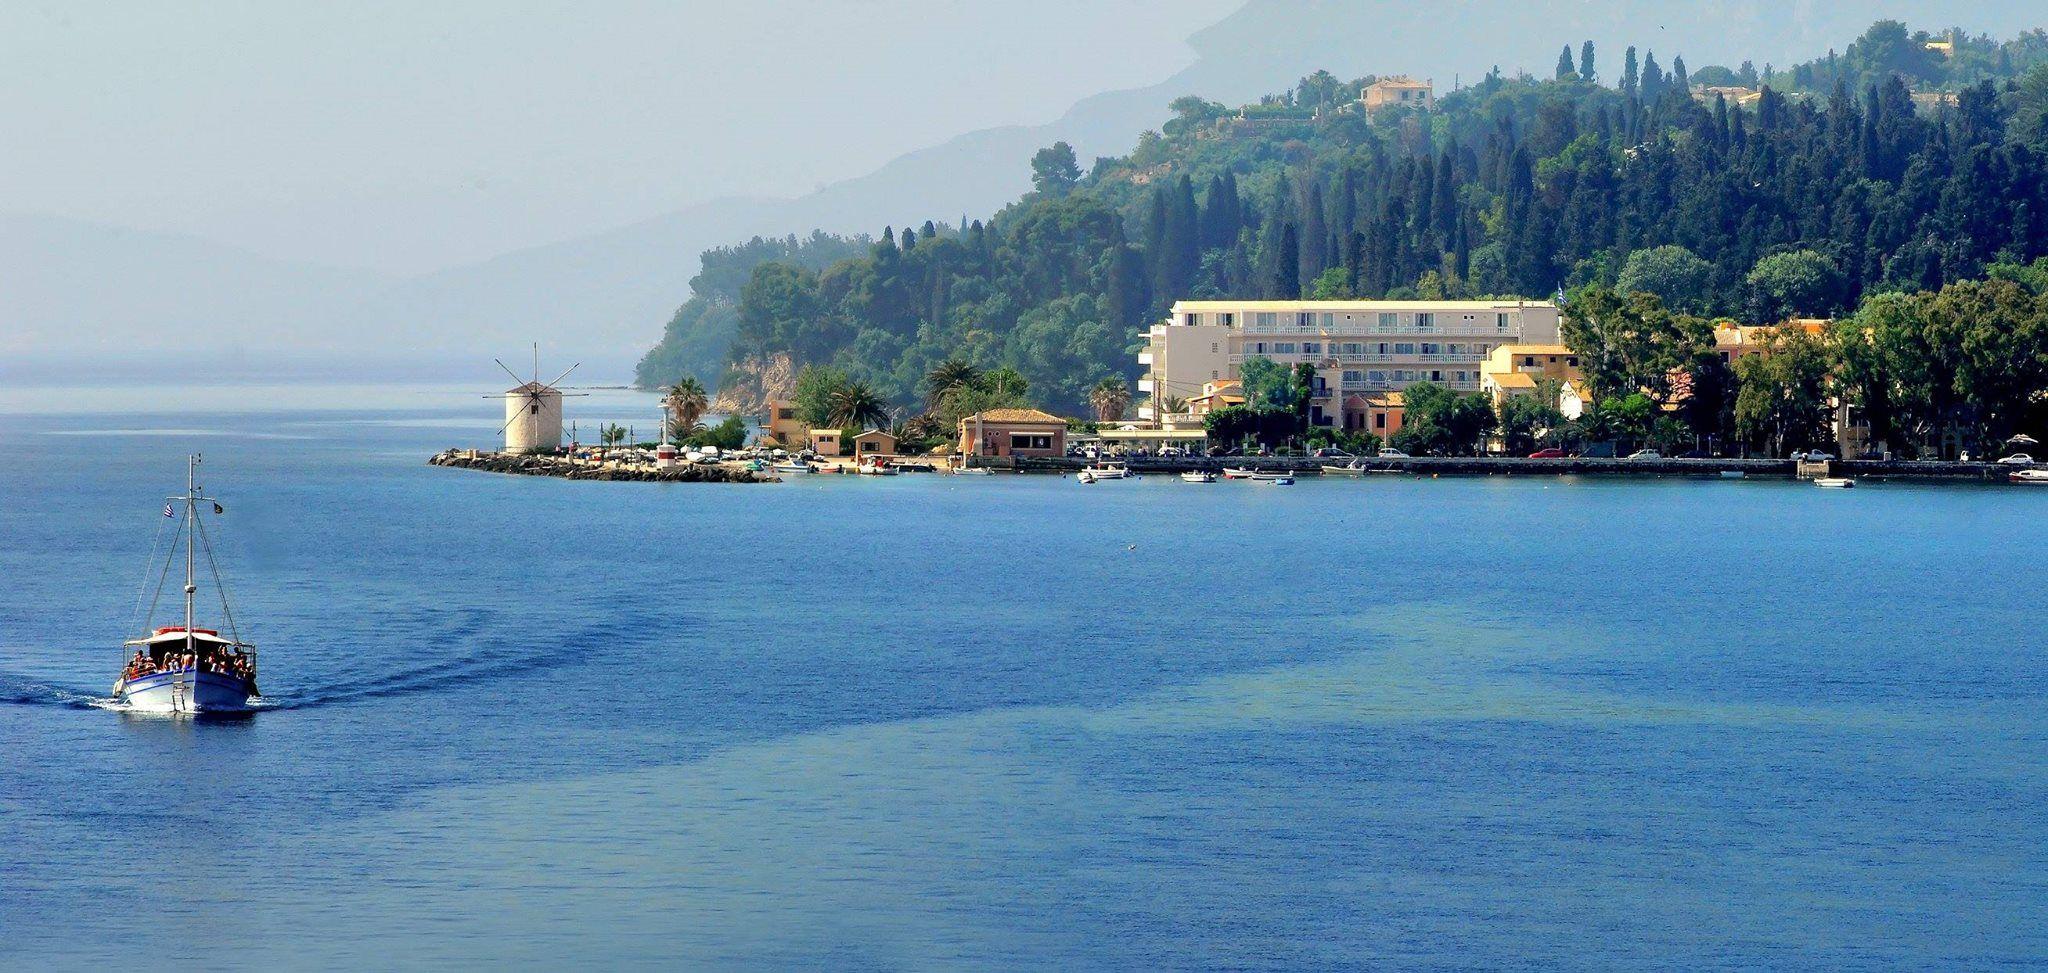 "Wonderful #GaritsasGulf comprises the natural hosting venue for #MonReposPalace. The landscape for so-called ""City Hotel' is phenomenal! #MayorMonReposPalace #Corfu"